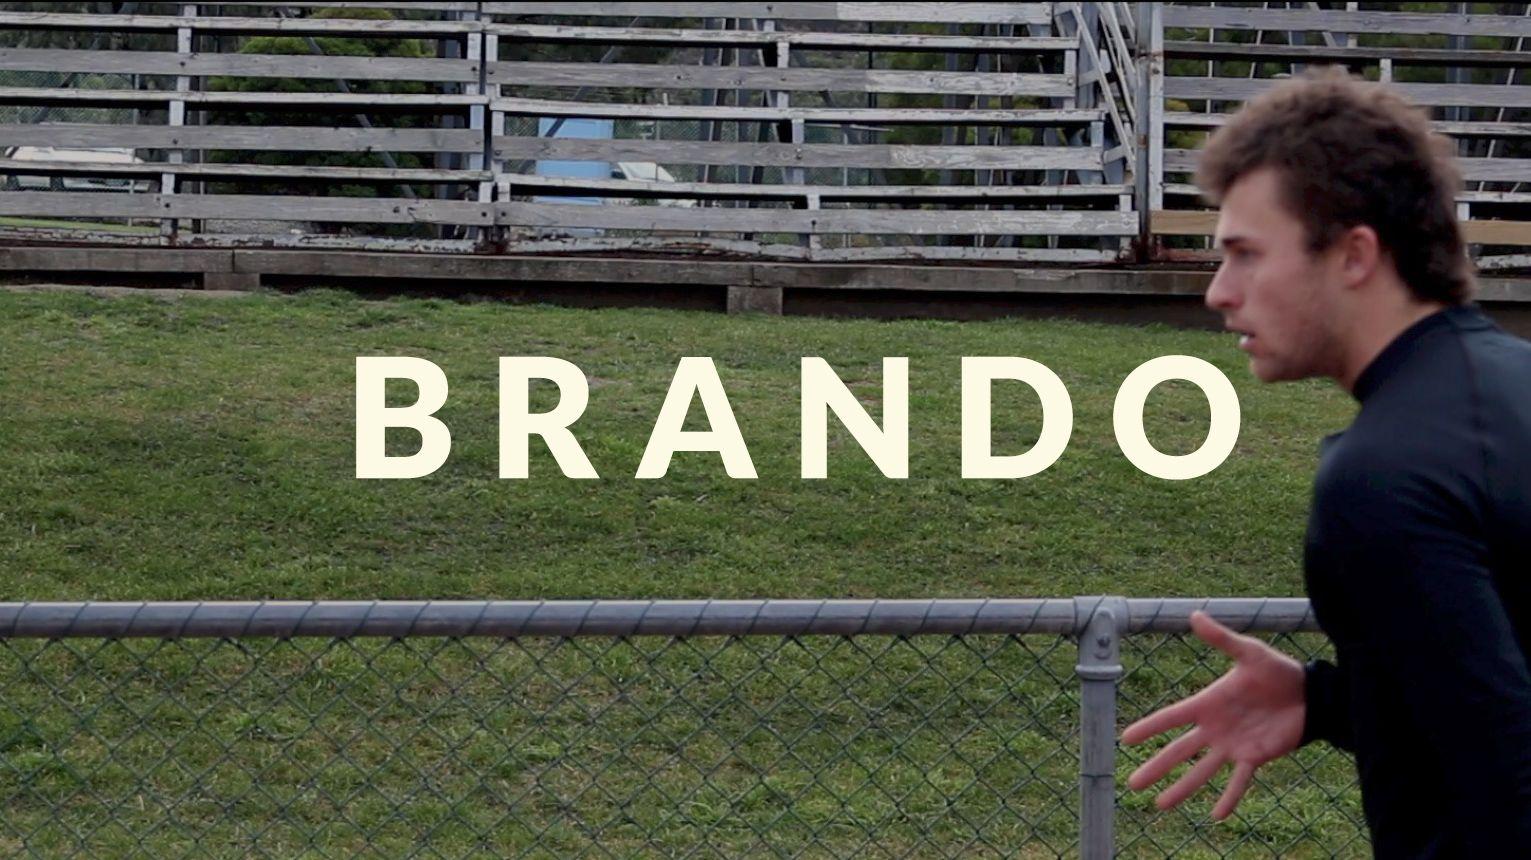 brandon doing the long jump